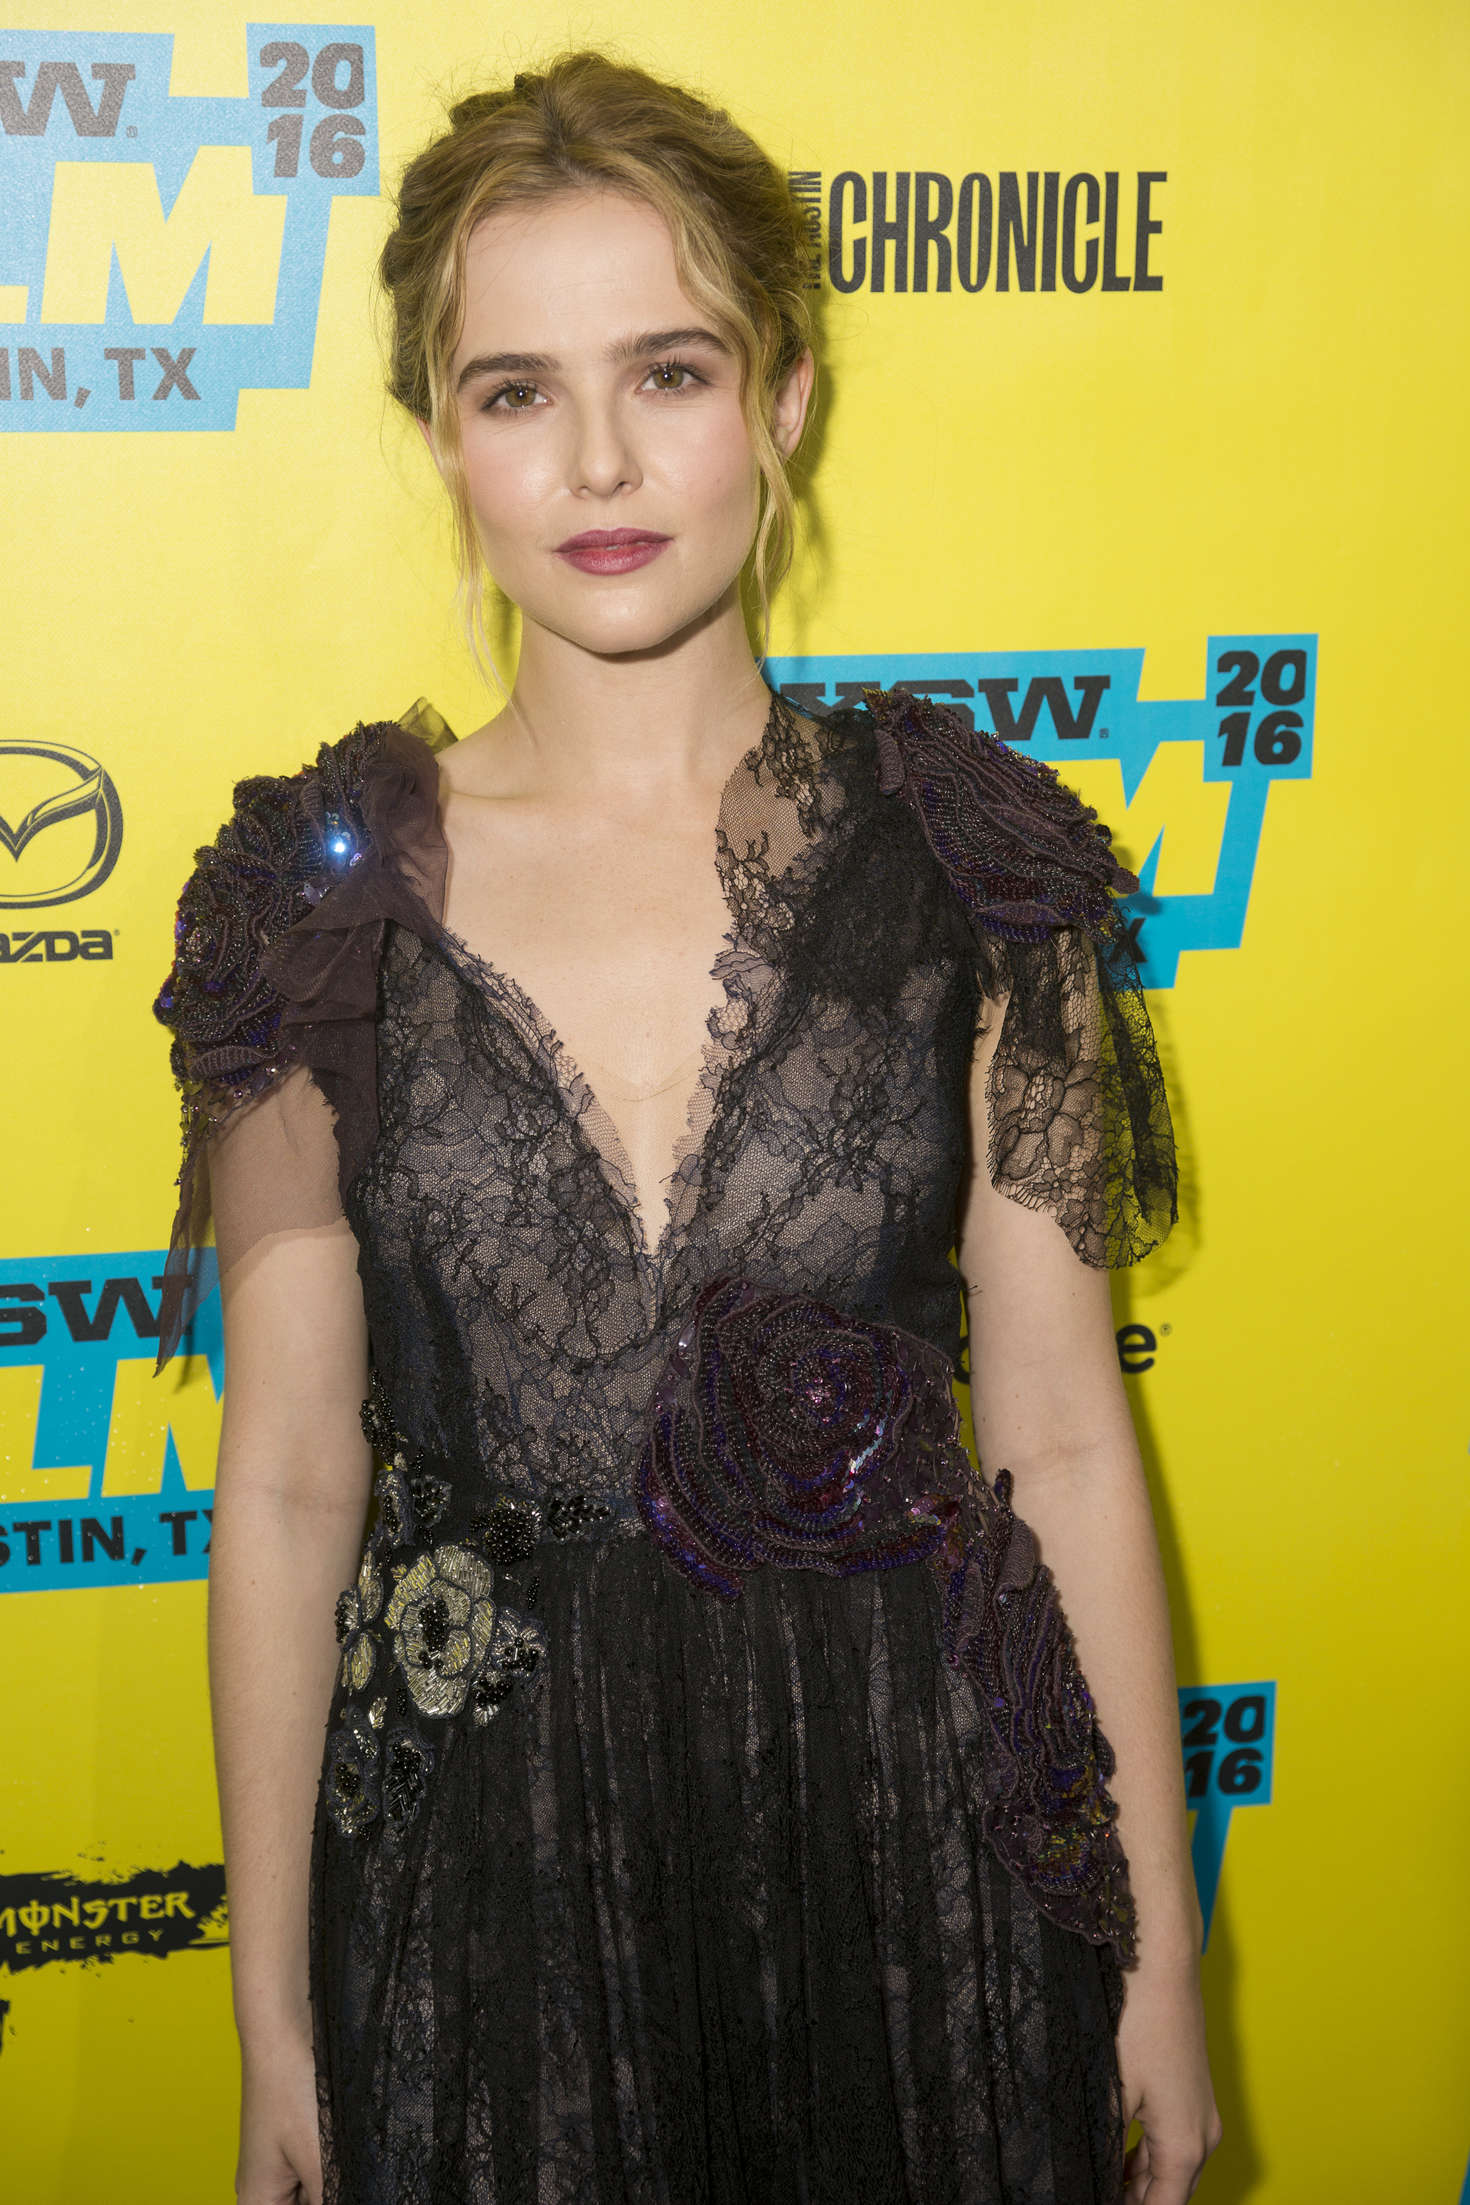 Zoey Deutch - 'Everybody Wants Some' Premiere at 2016 SXSW Film Festival in Austin